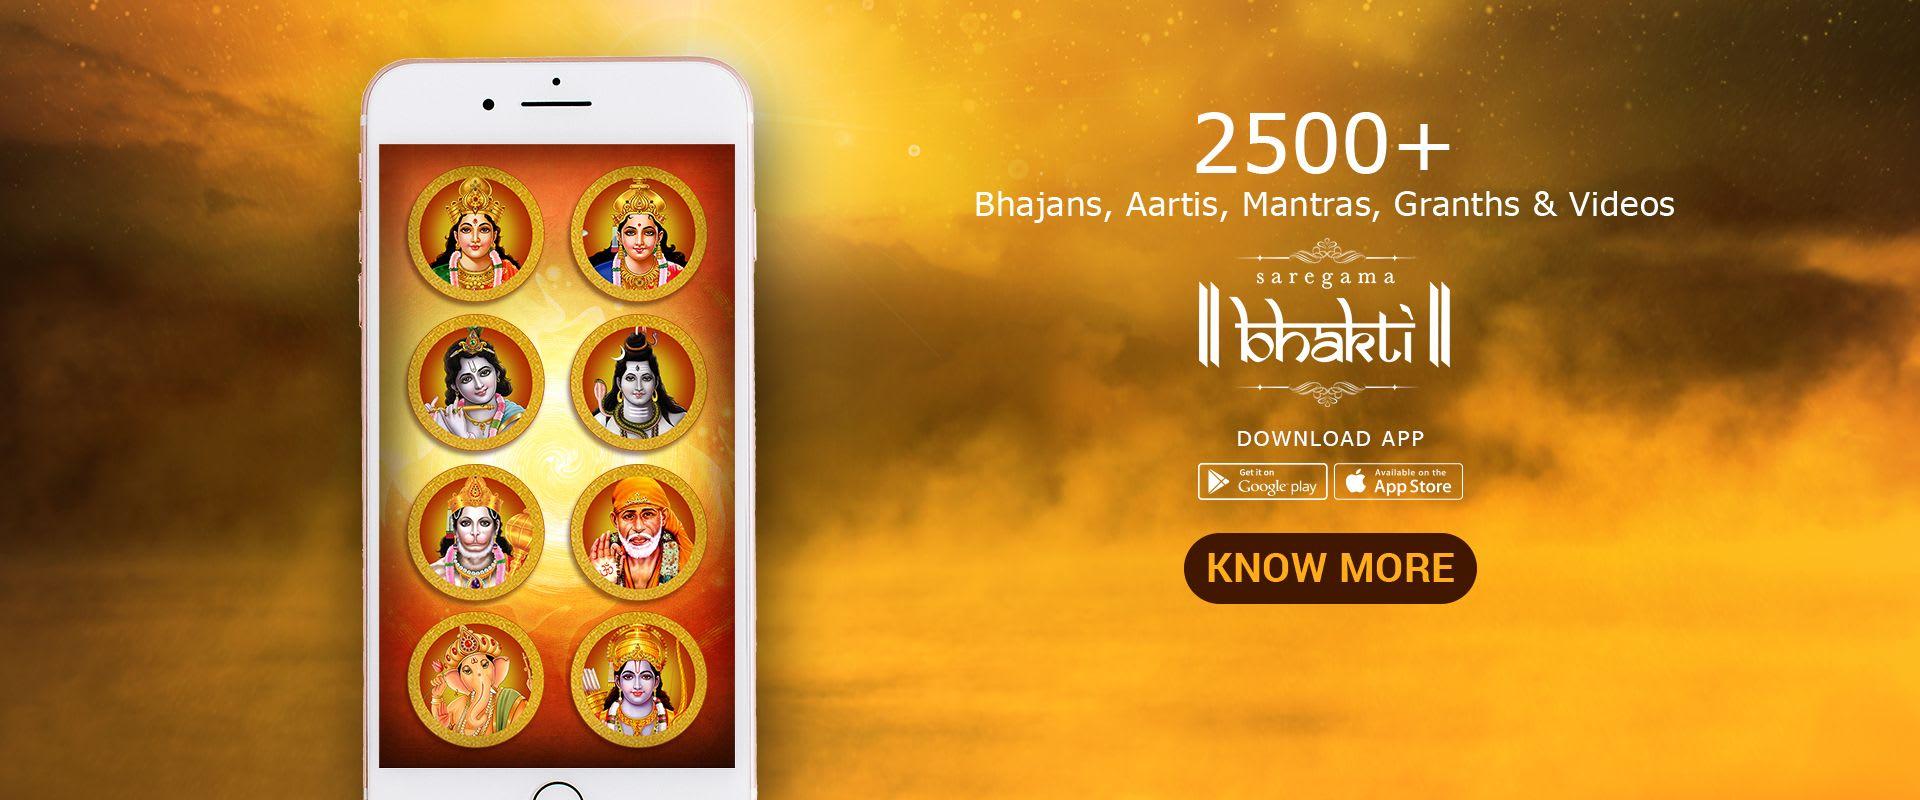 Bhakti App